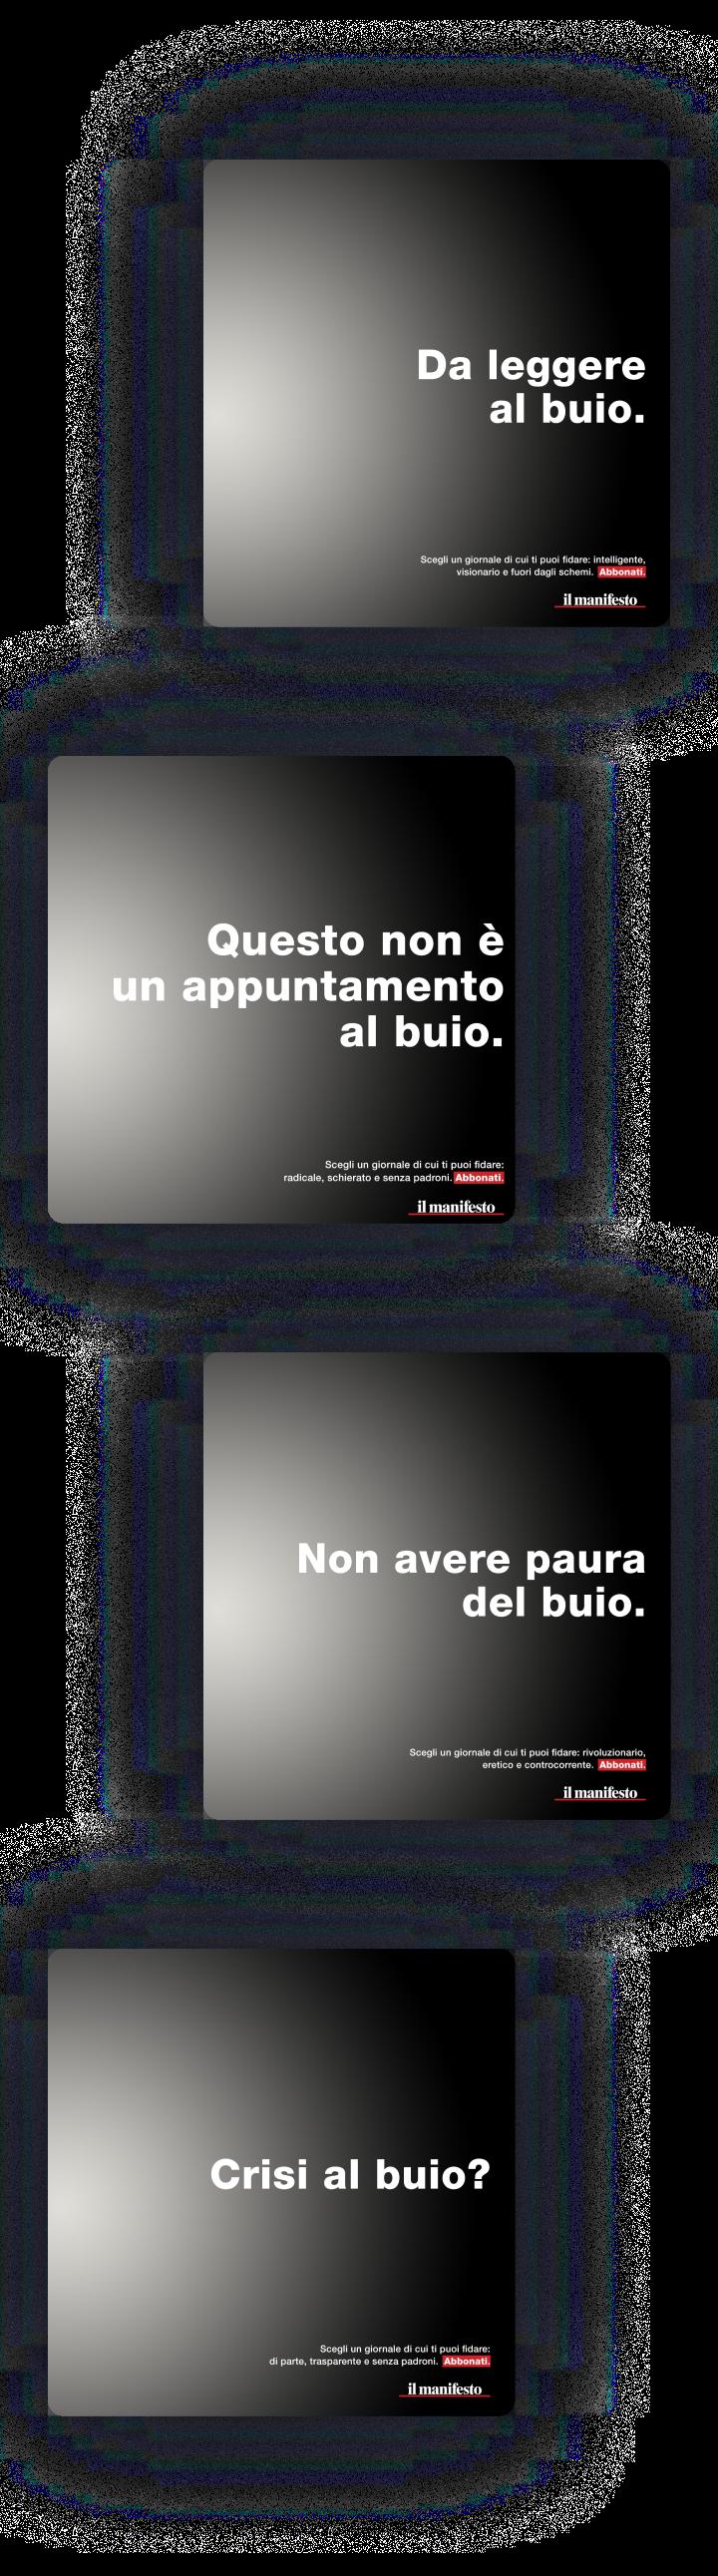 Concept_card_mobile